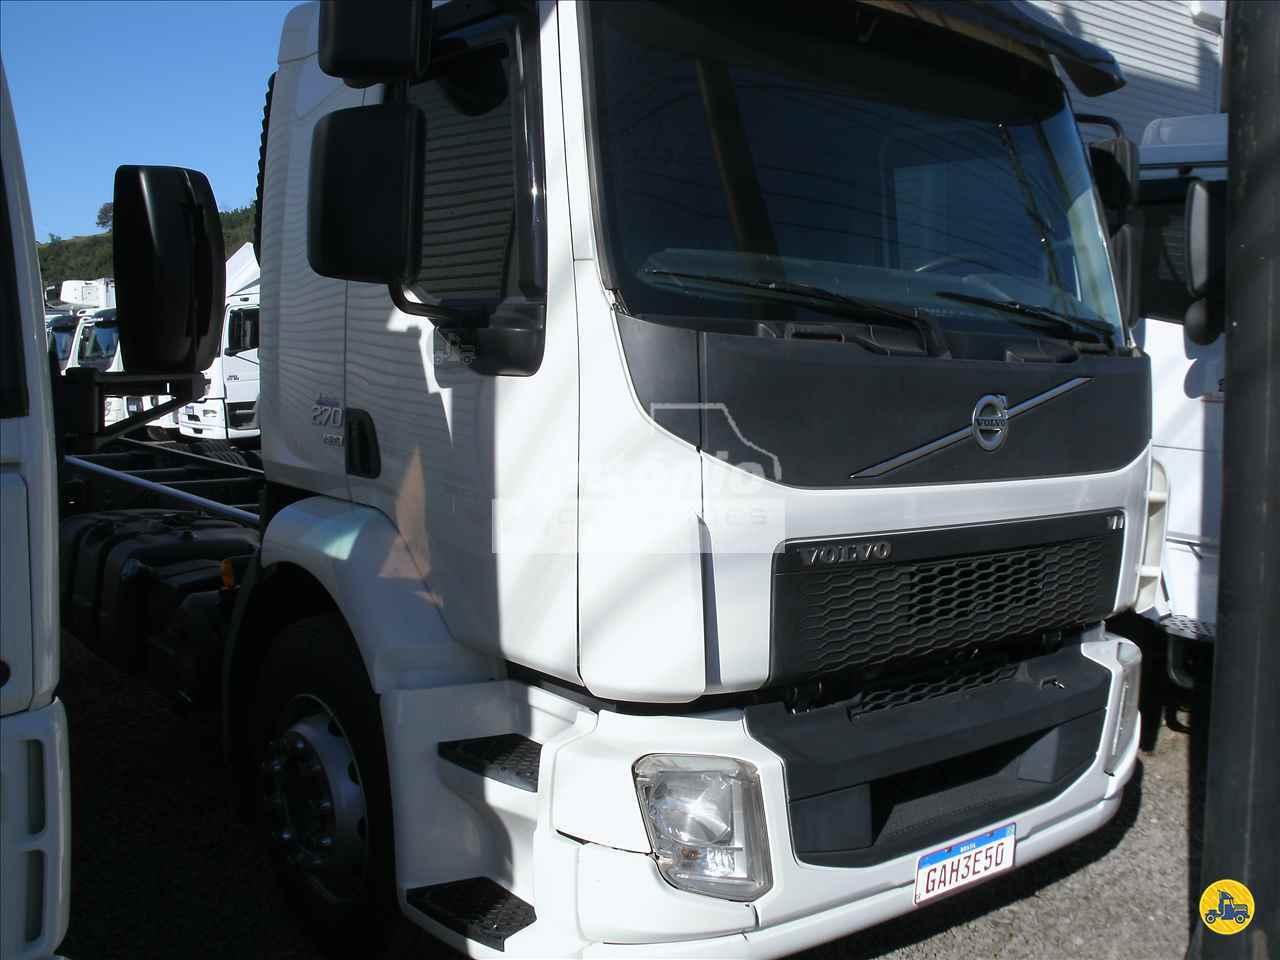 CAMINHAO VOLVO VOLVO VM 270 Chassis Truck 6x2 Antônio Caminhões GARIBALDI RIO GRANDE DO SUL RS